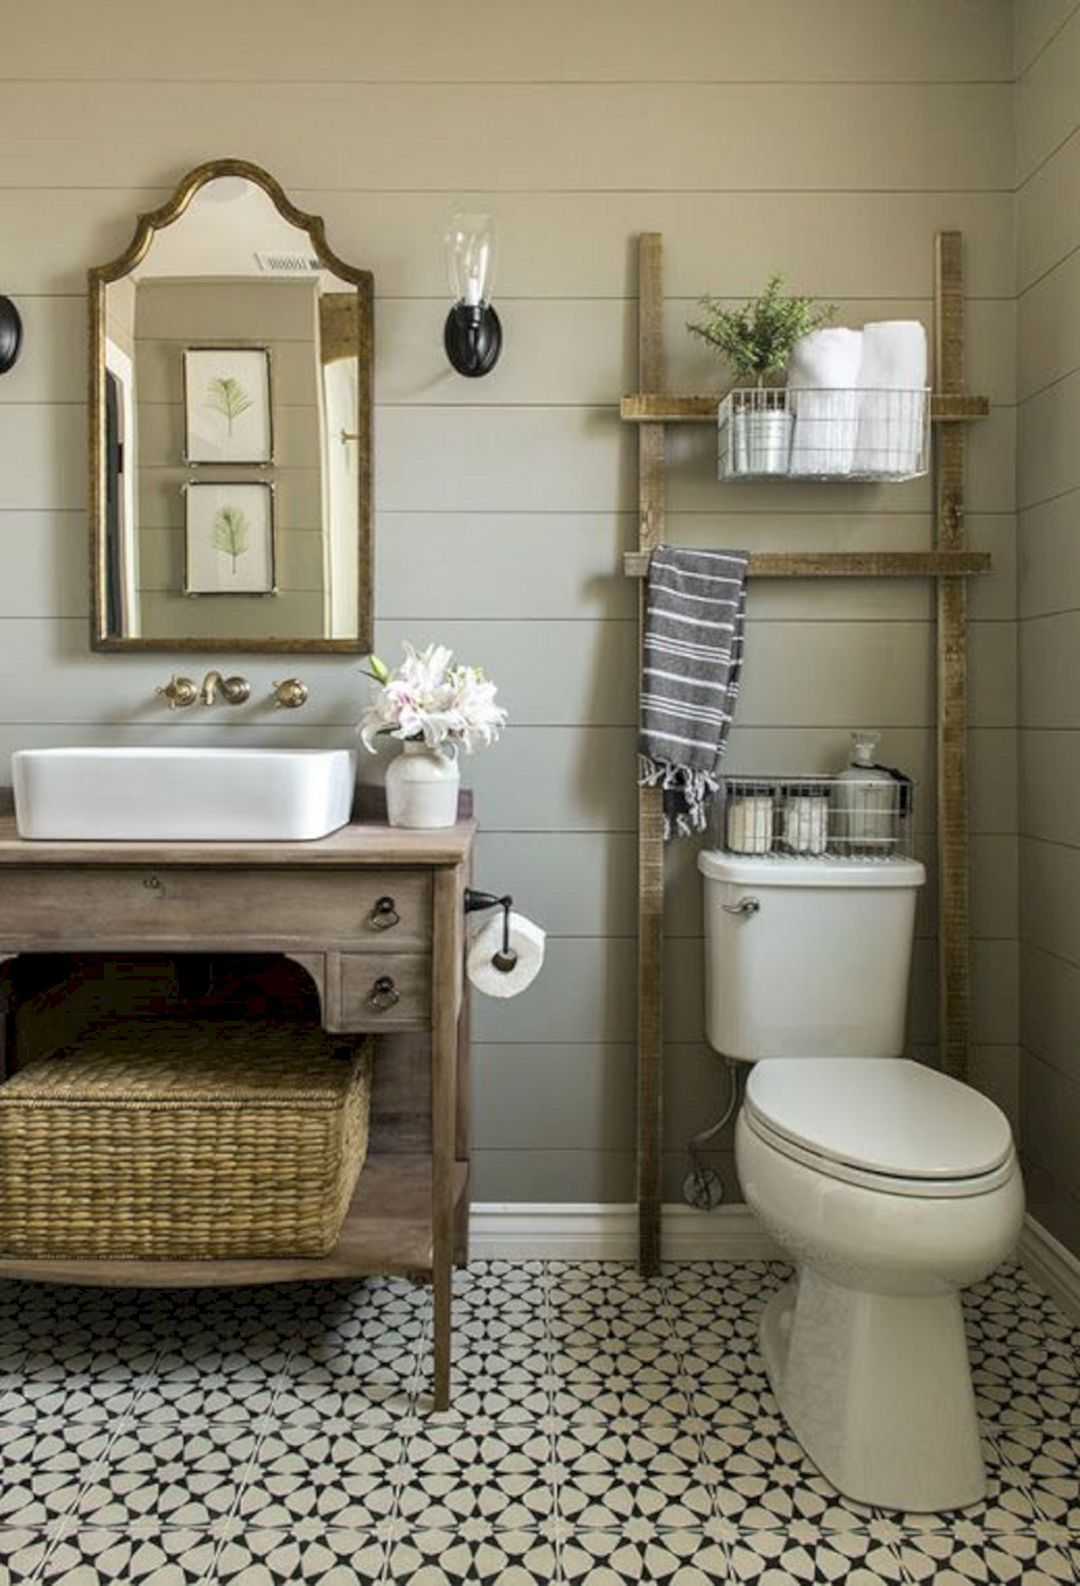 Flawless 60 Elegant French Country Home Architecture Ideas Https Freshouz Com 60 Small Bathroom Remodel Beautiful Bathroom Renovations Bathroom Design Small